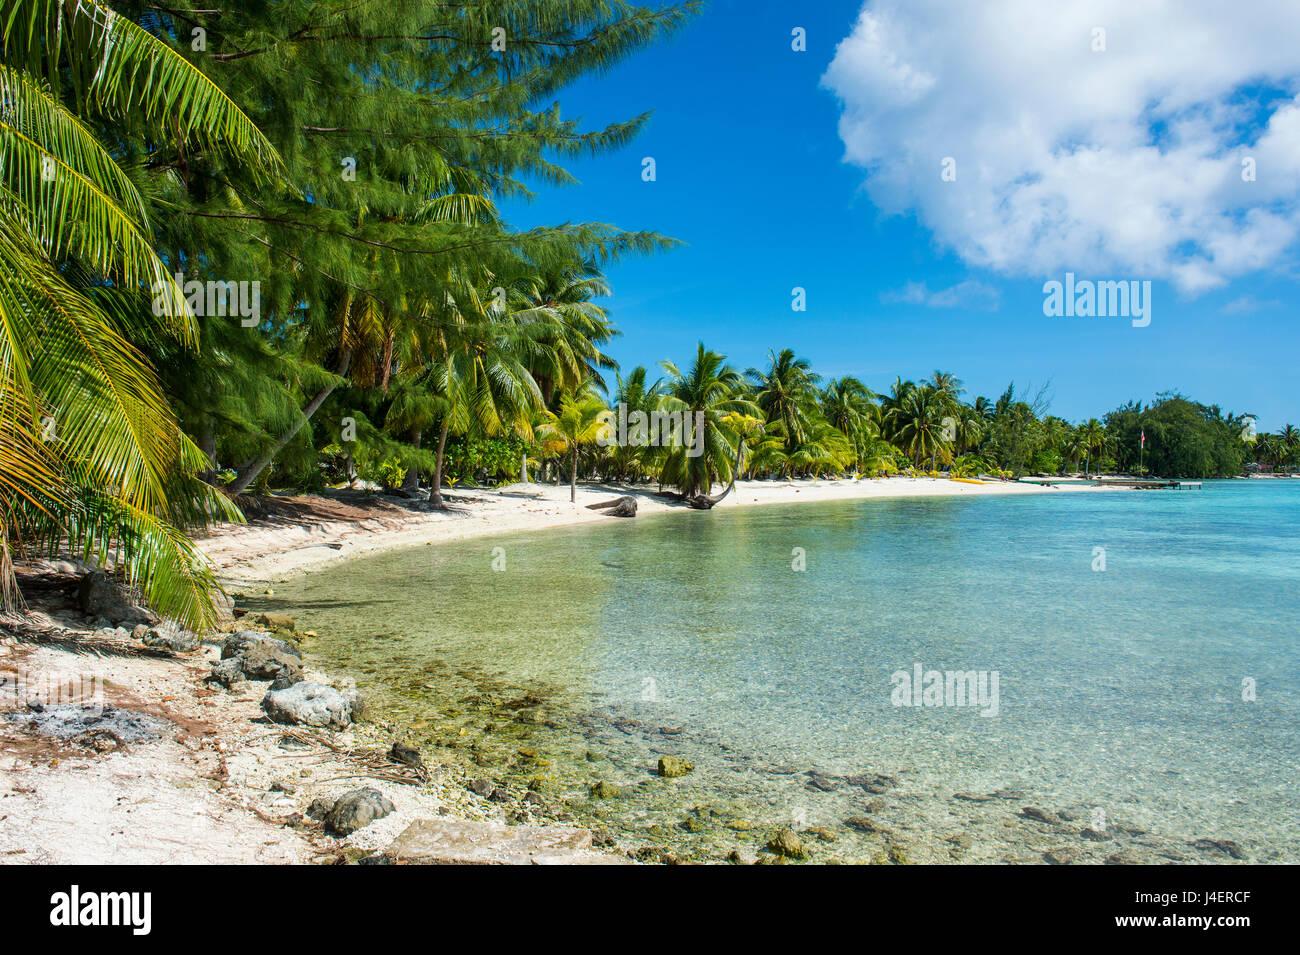 Beautiful palm fringed white sand beach in the turquoise waters of Tikehau, Tuamotus, French Polynesia, Pacific Stock Photo